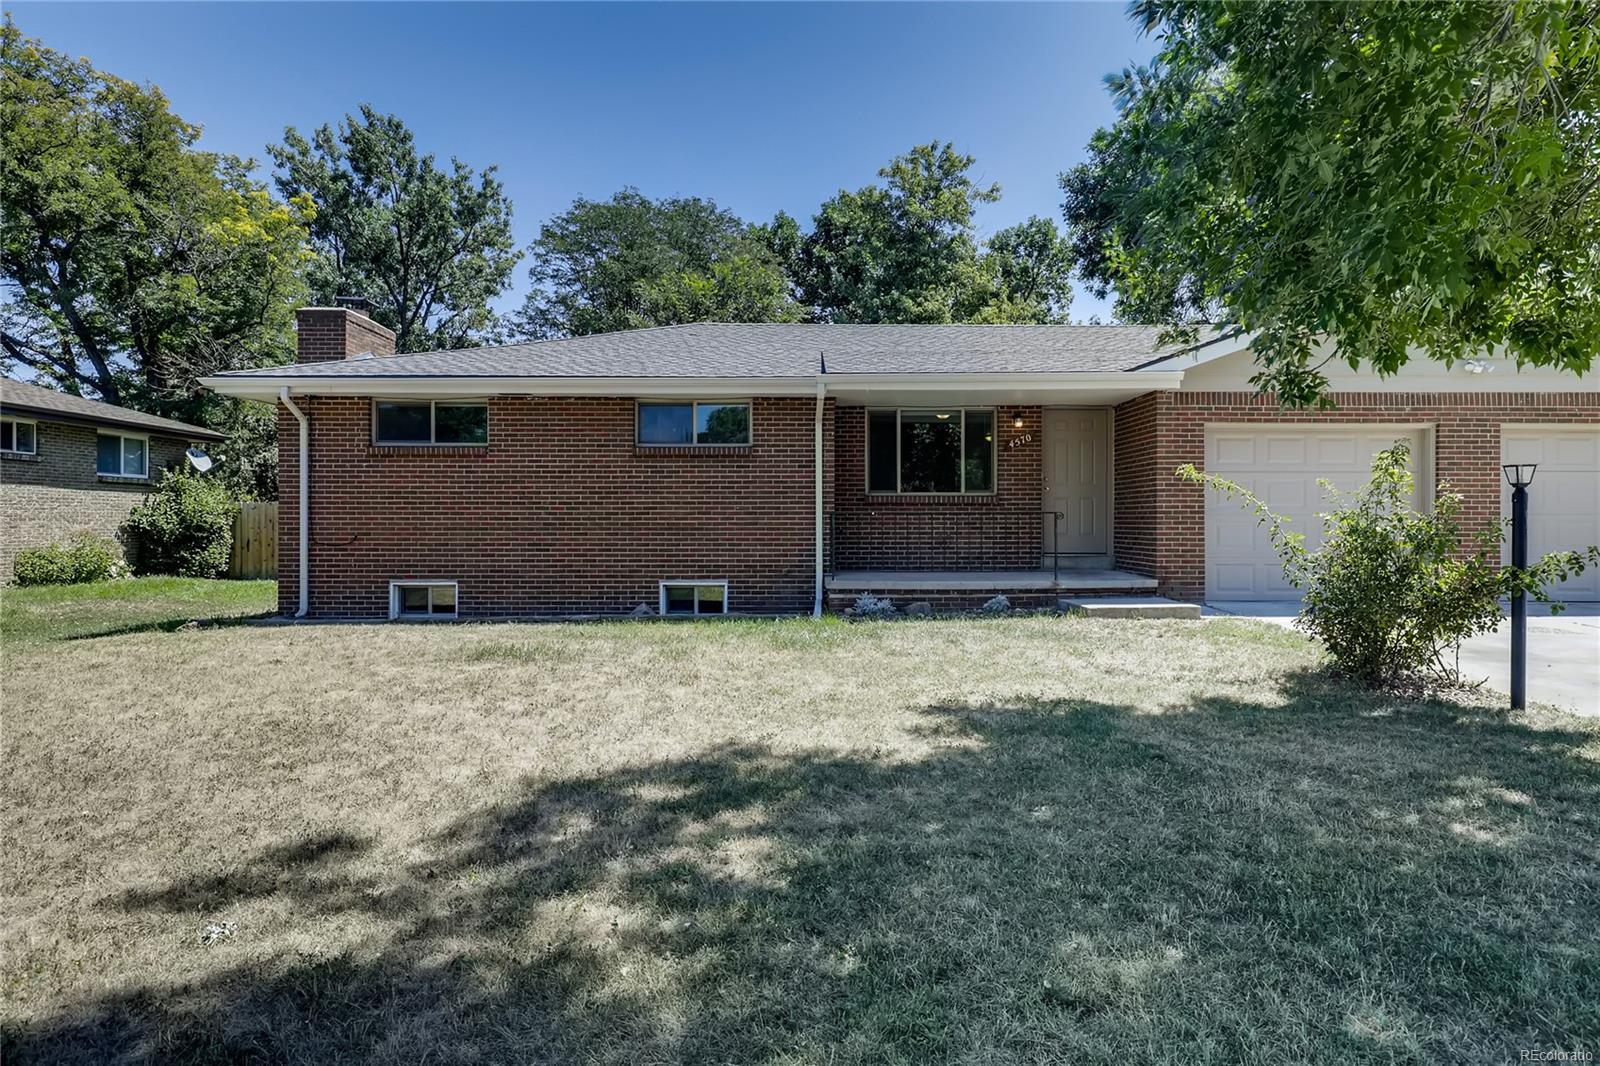 4568 Hoyt Street, Wheat Ridge, CO 80033 - Wheat Ridge, CO real estate listing